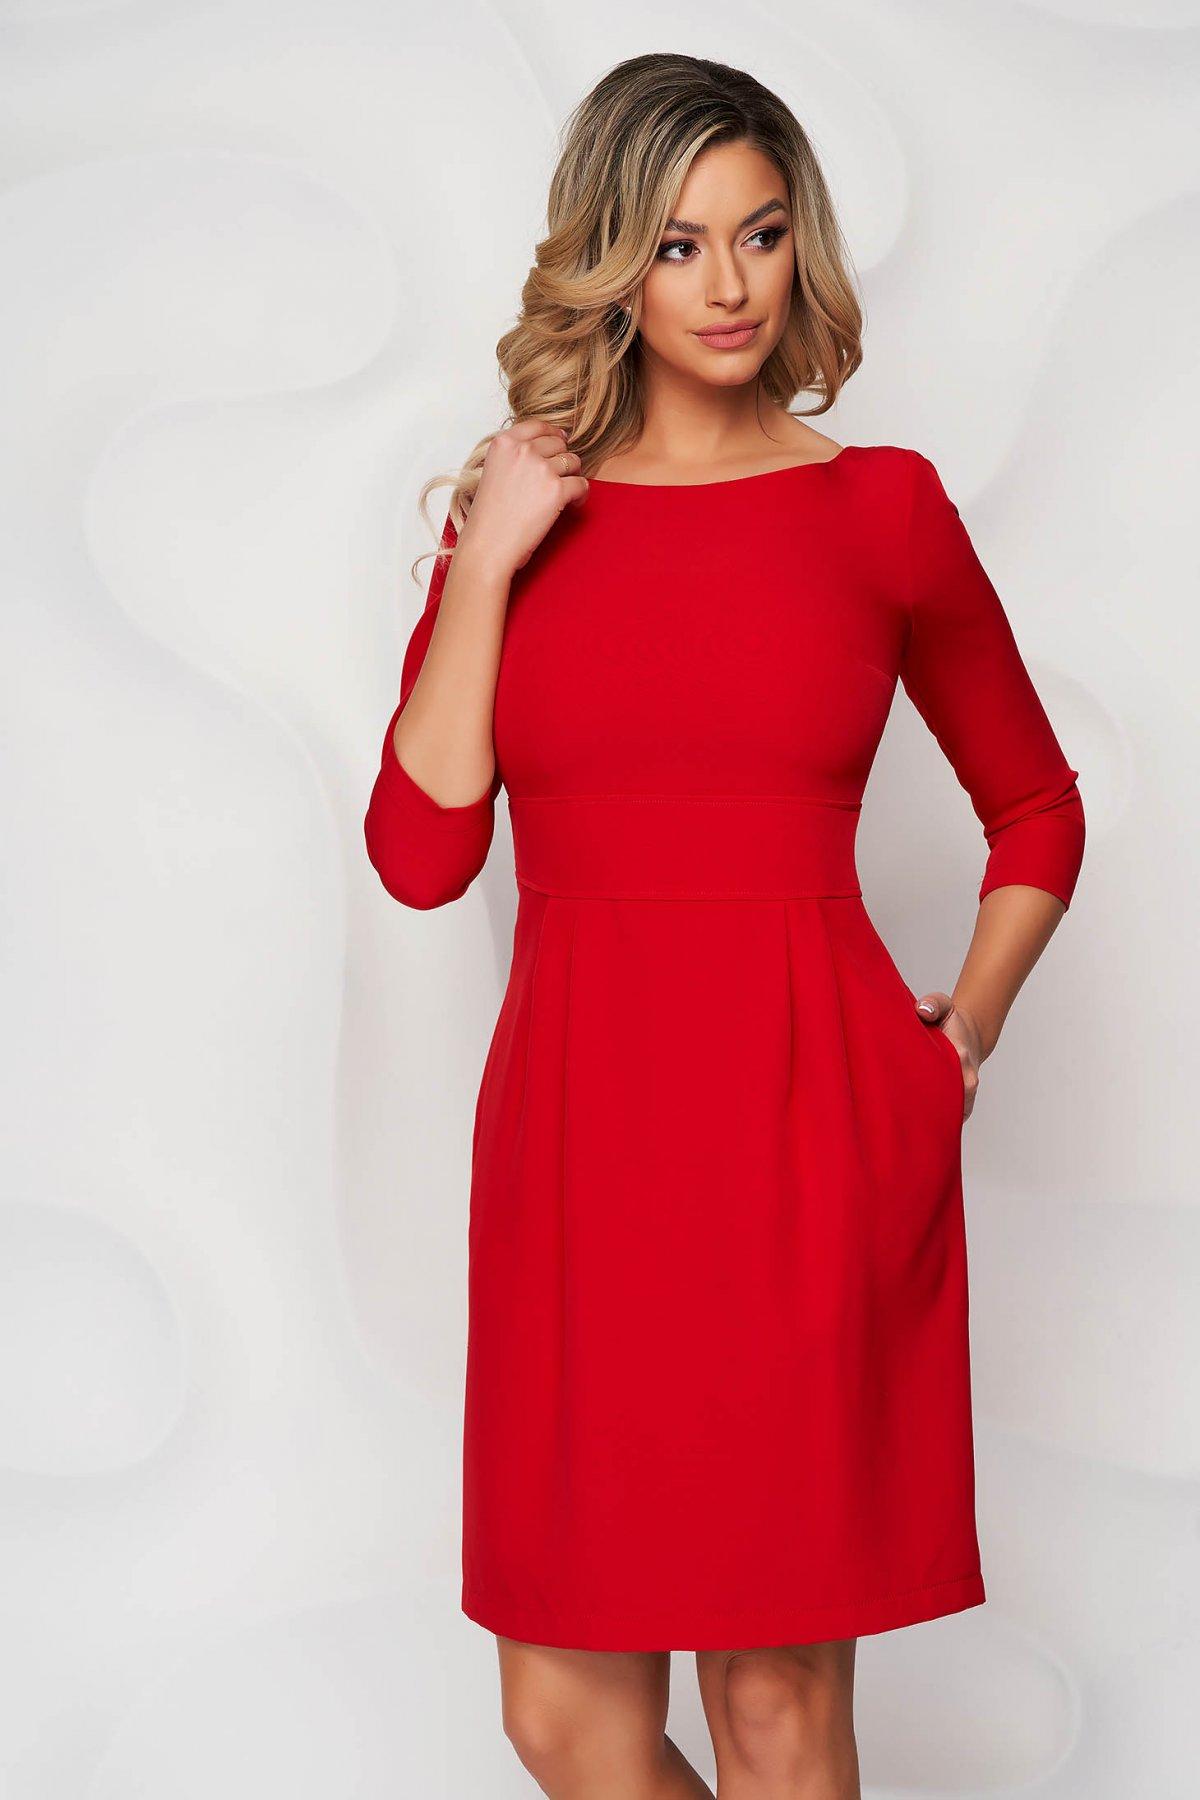 Rochie StarShinerS rosie scurta din stofa usor elastica cu croi in a si buzunare - medelin.ro